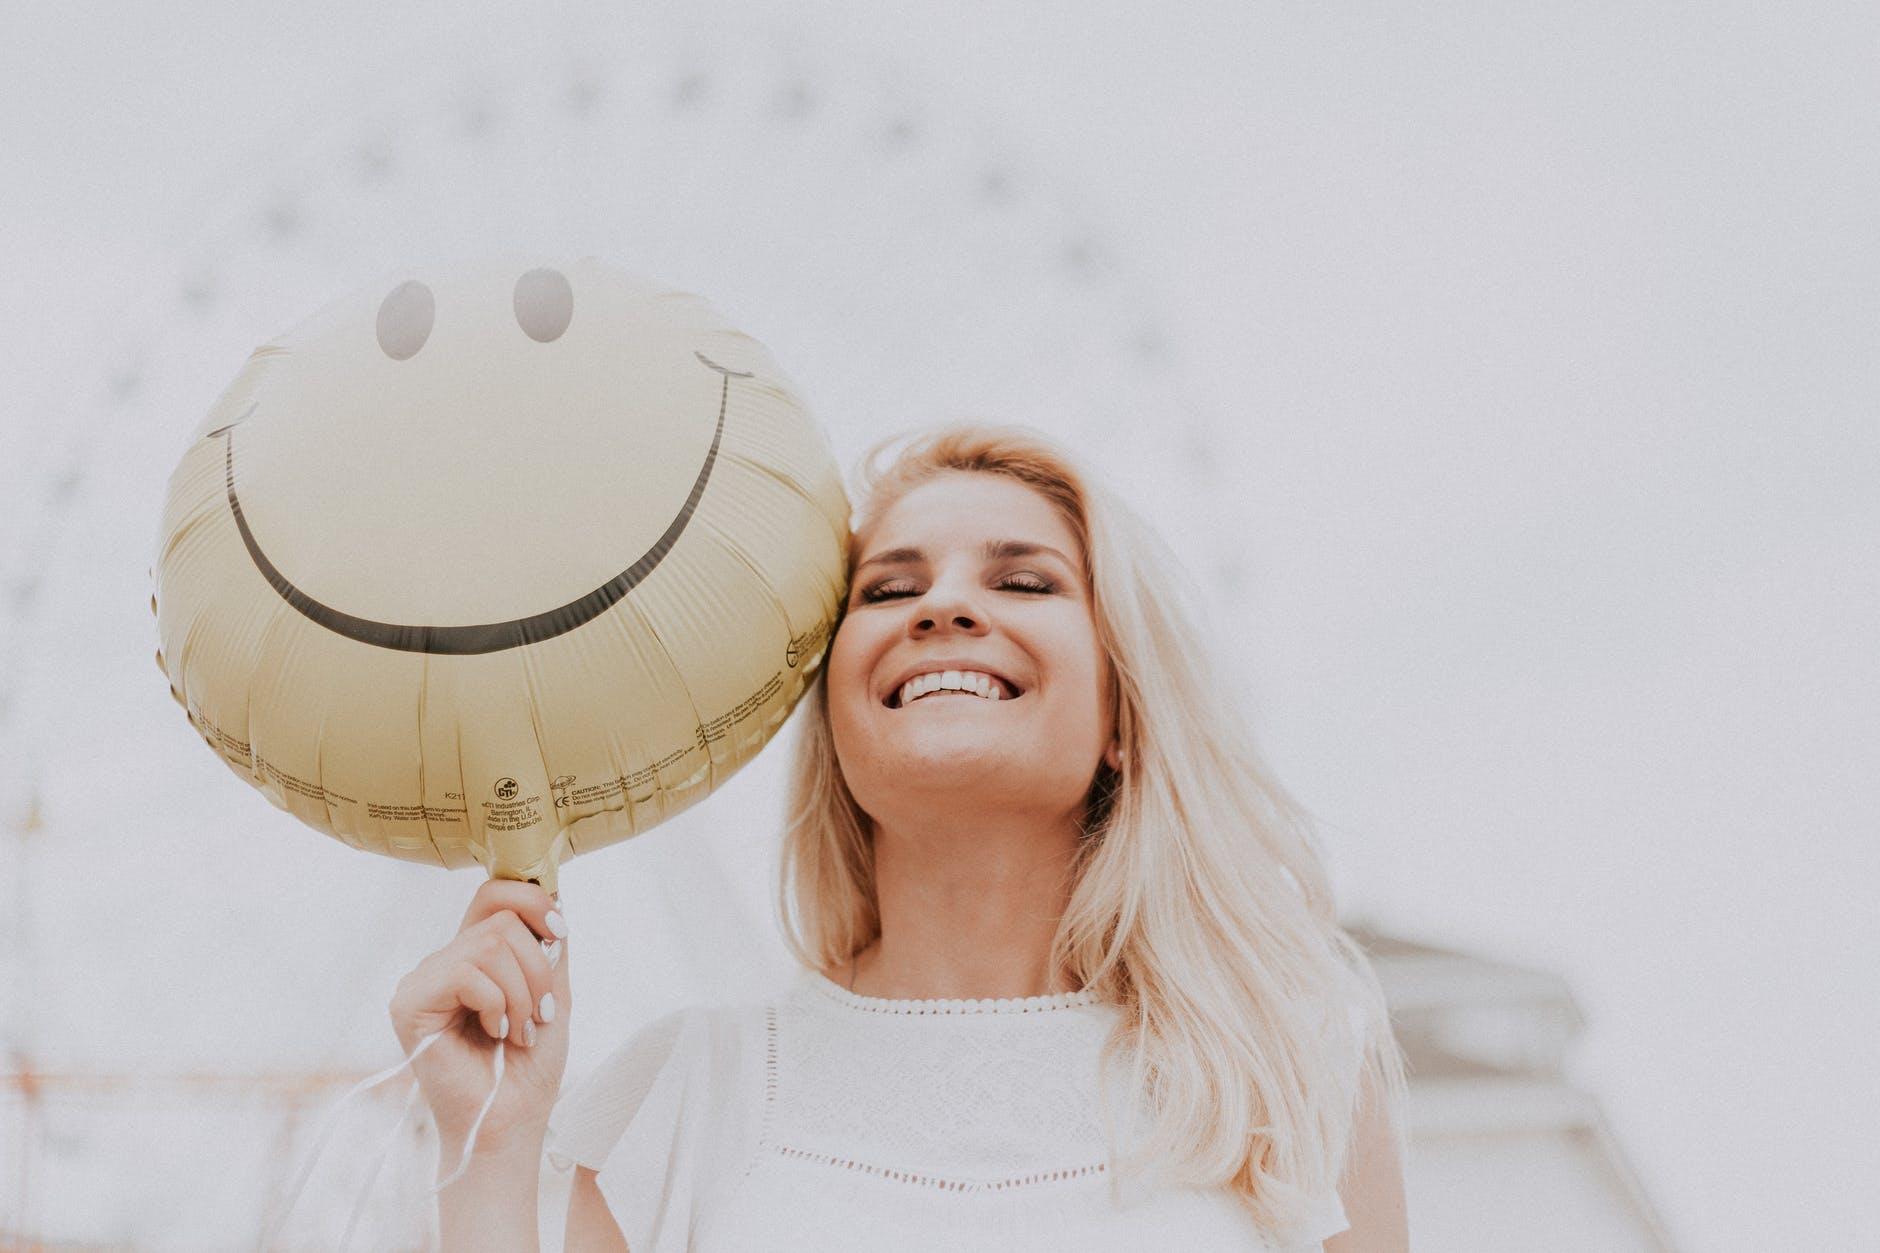 une femme souriante avec un ballon smiley